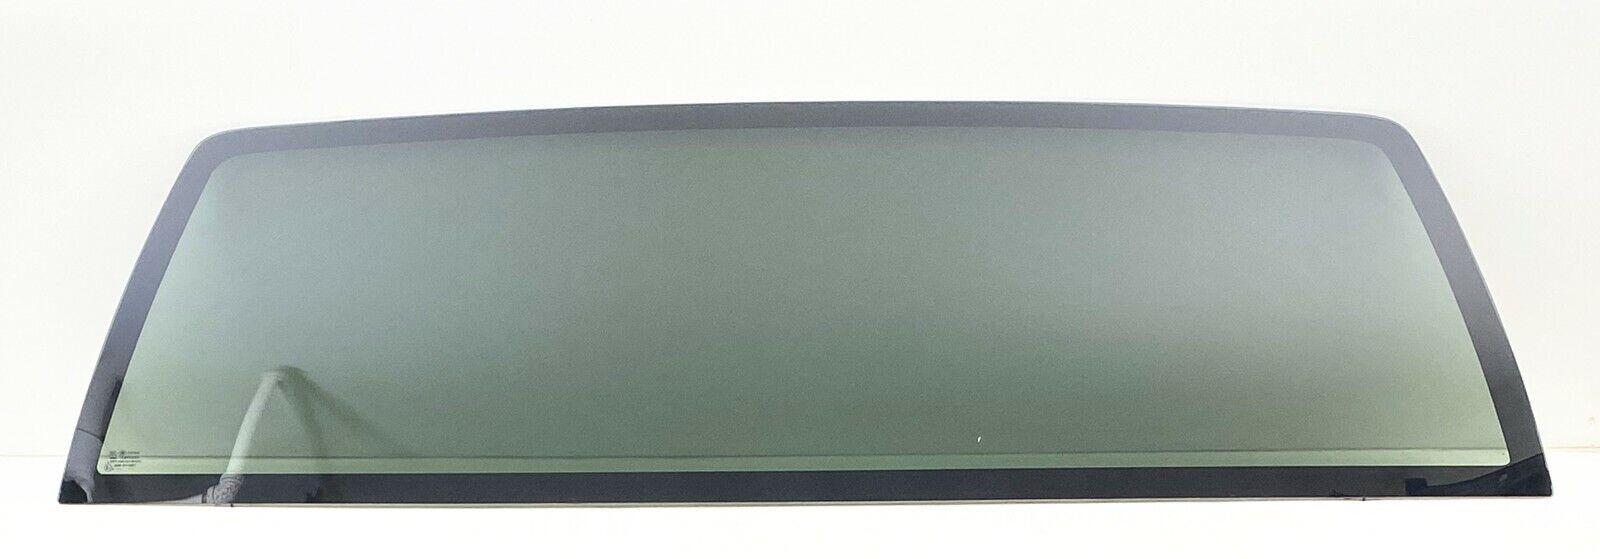 1999-2006 Chevy GMC Silverado Pickup Rear Window Back Glass NO HEATStationary